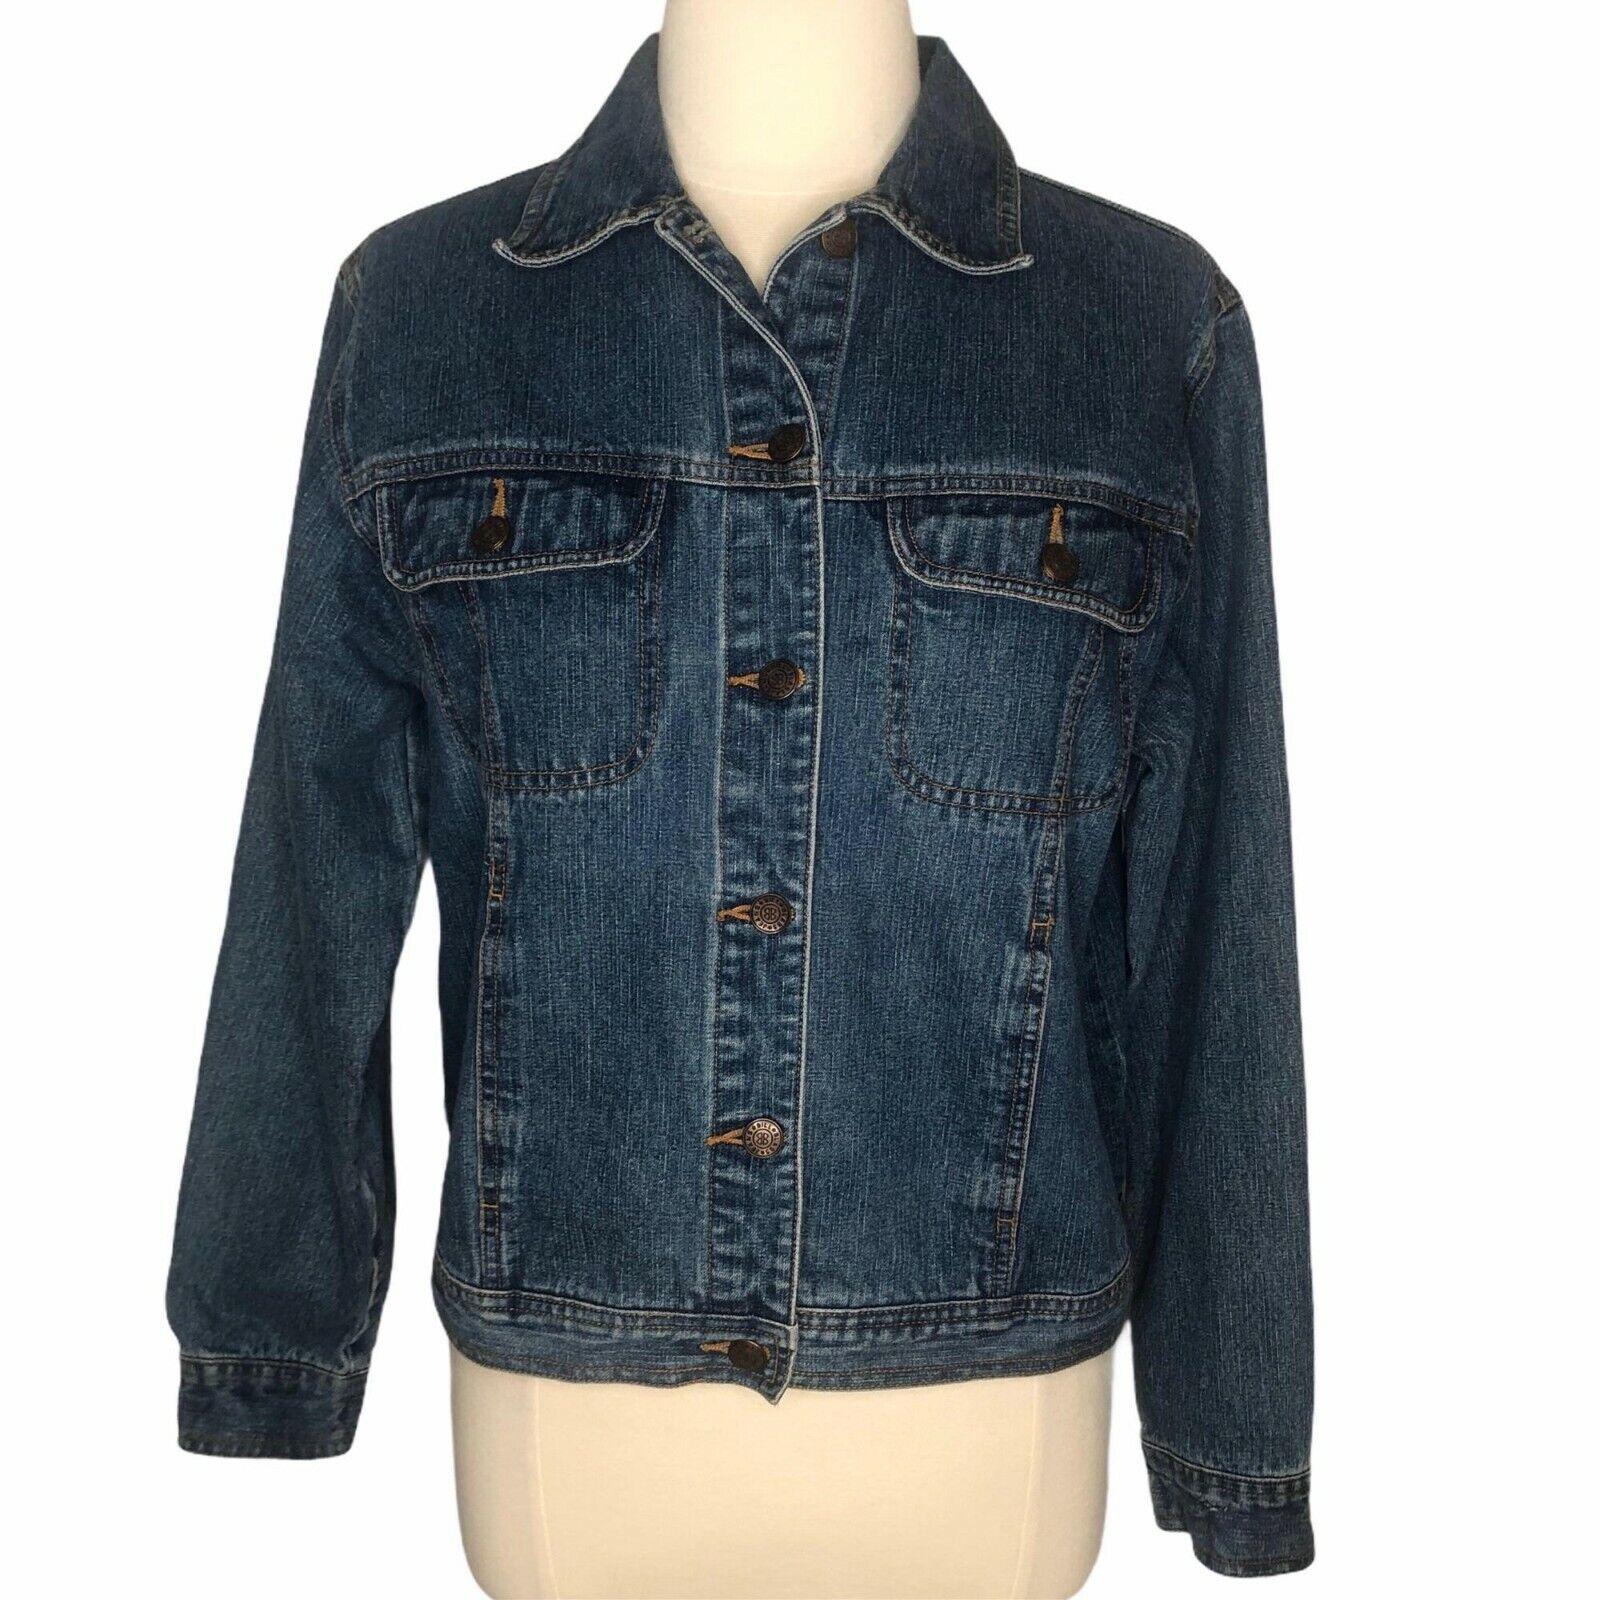 Bill Blass jean jacket denium LS front button medium